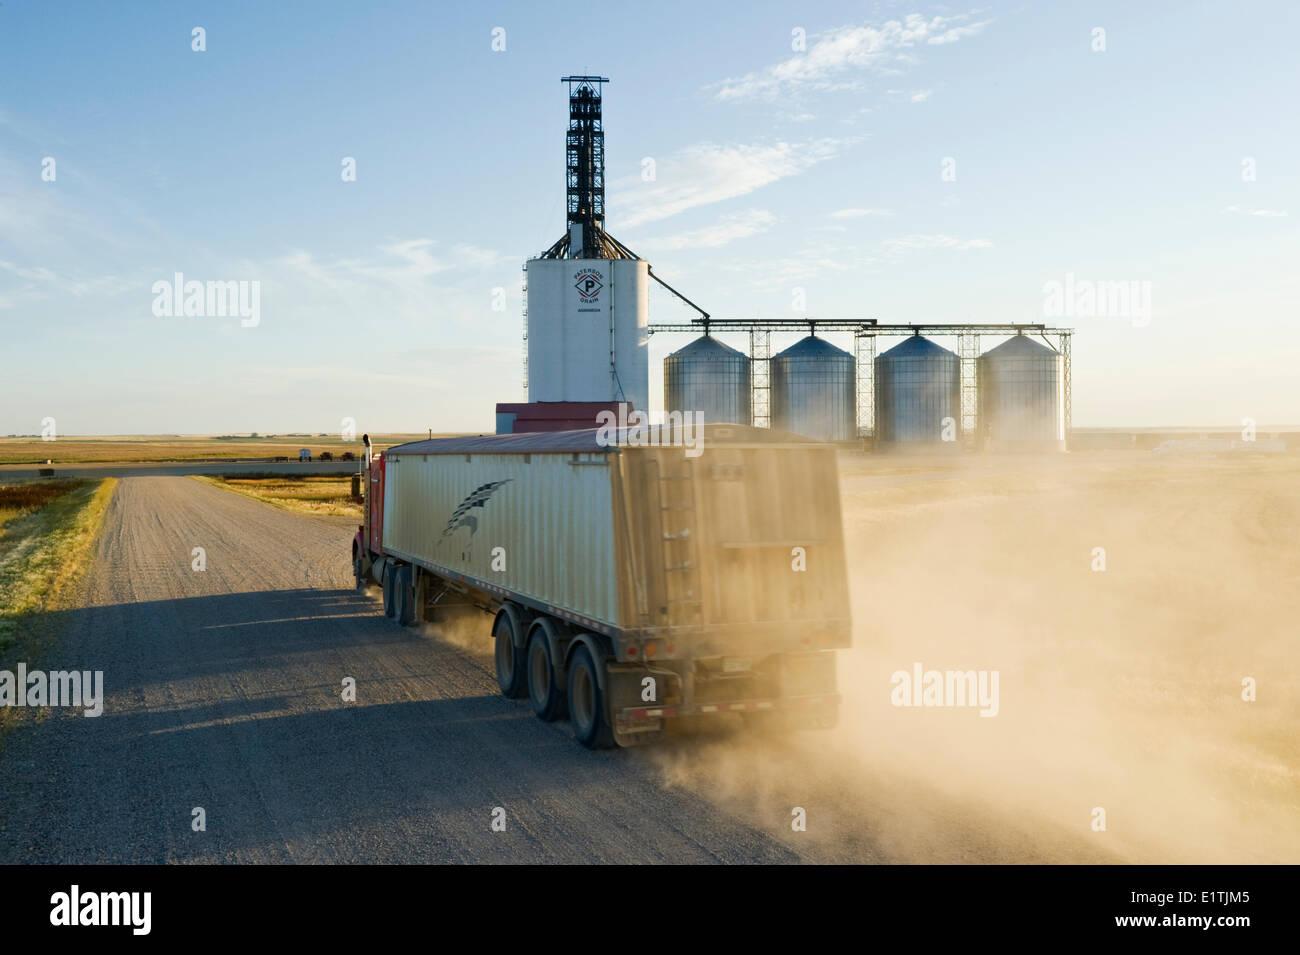 a truck hauls grain to an inland grain terminal/grain elevator  Assiniboia, Saskatchewan, Canada - Stock Image